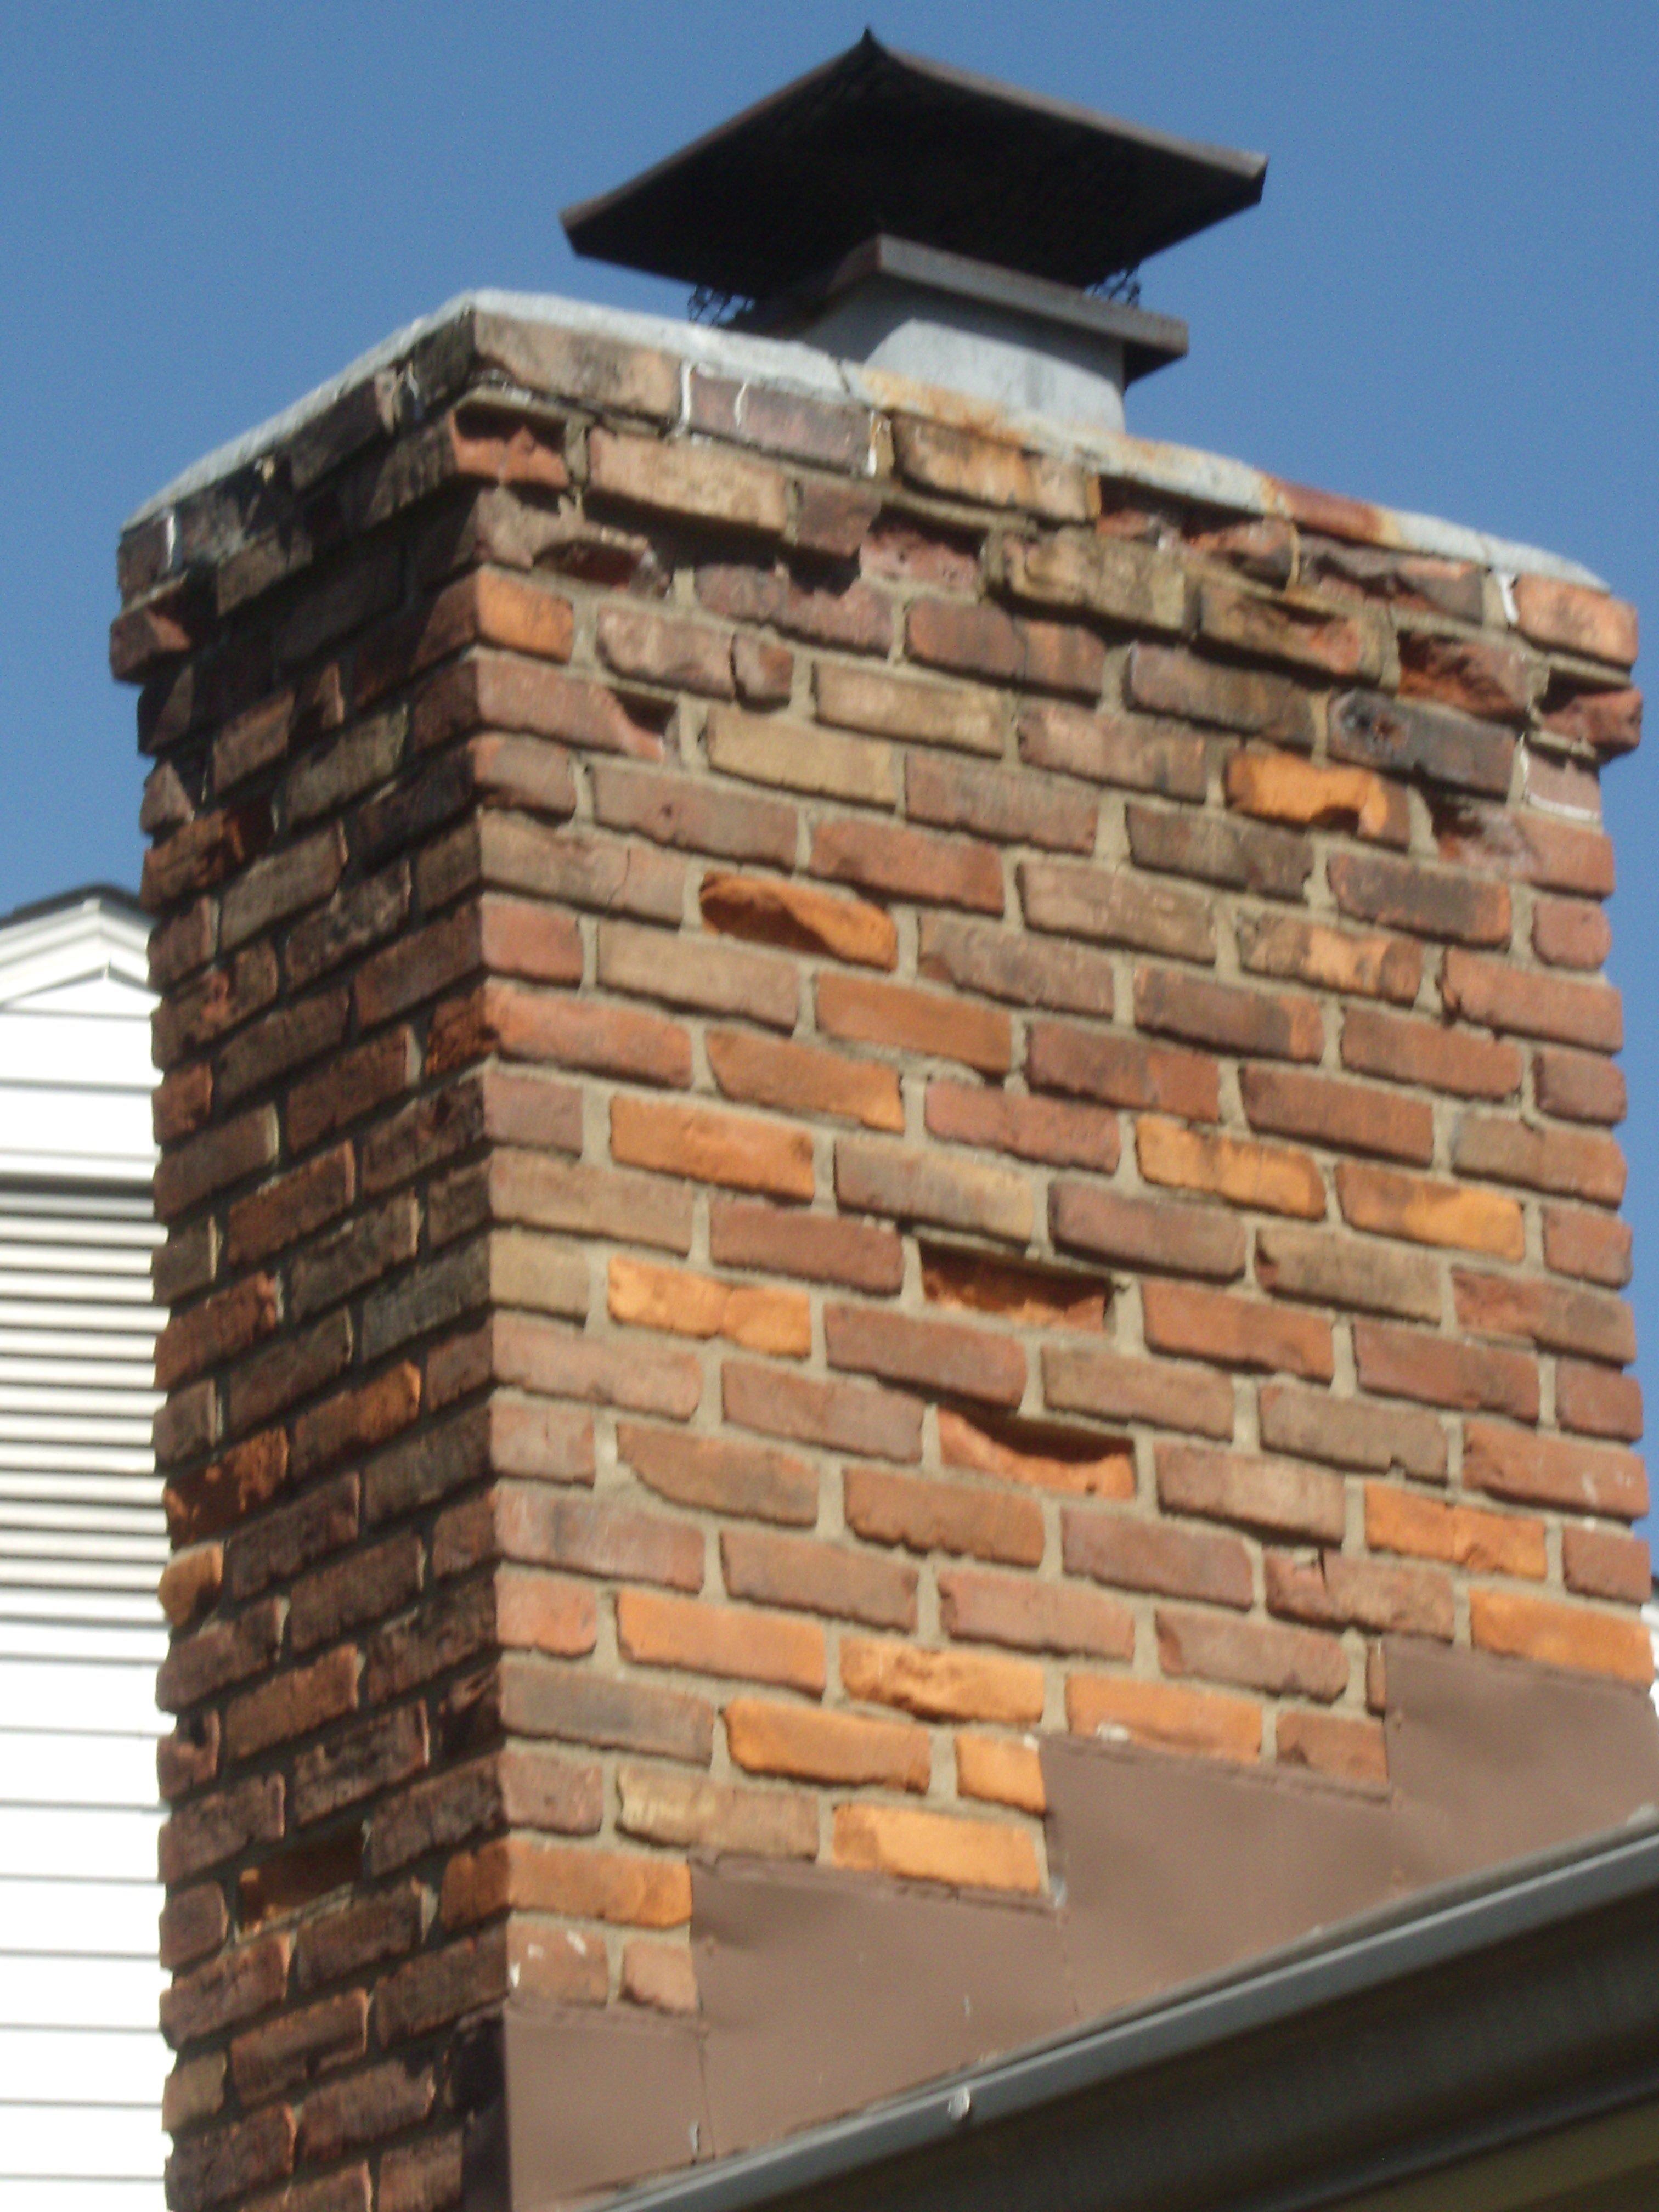 Brick chimney designs photos San Diego Chimney Gallery - Custom Masonry and Fireplace